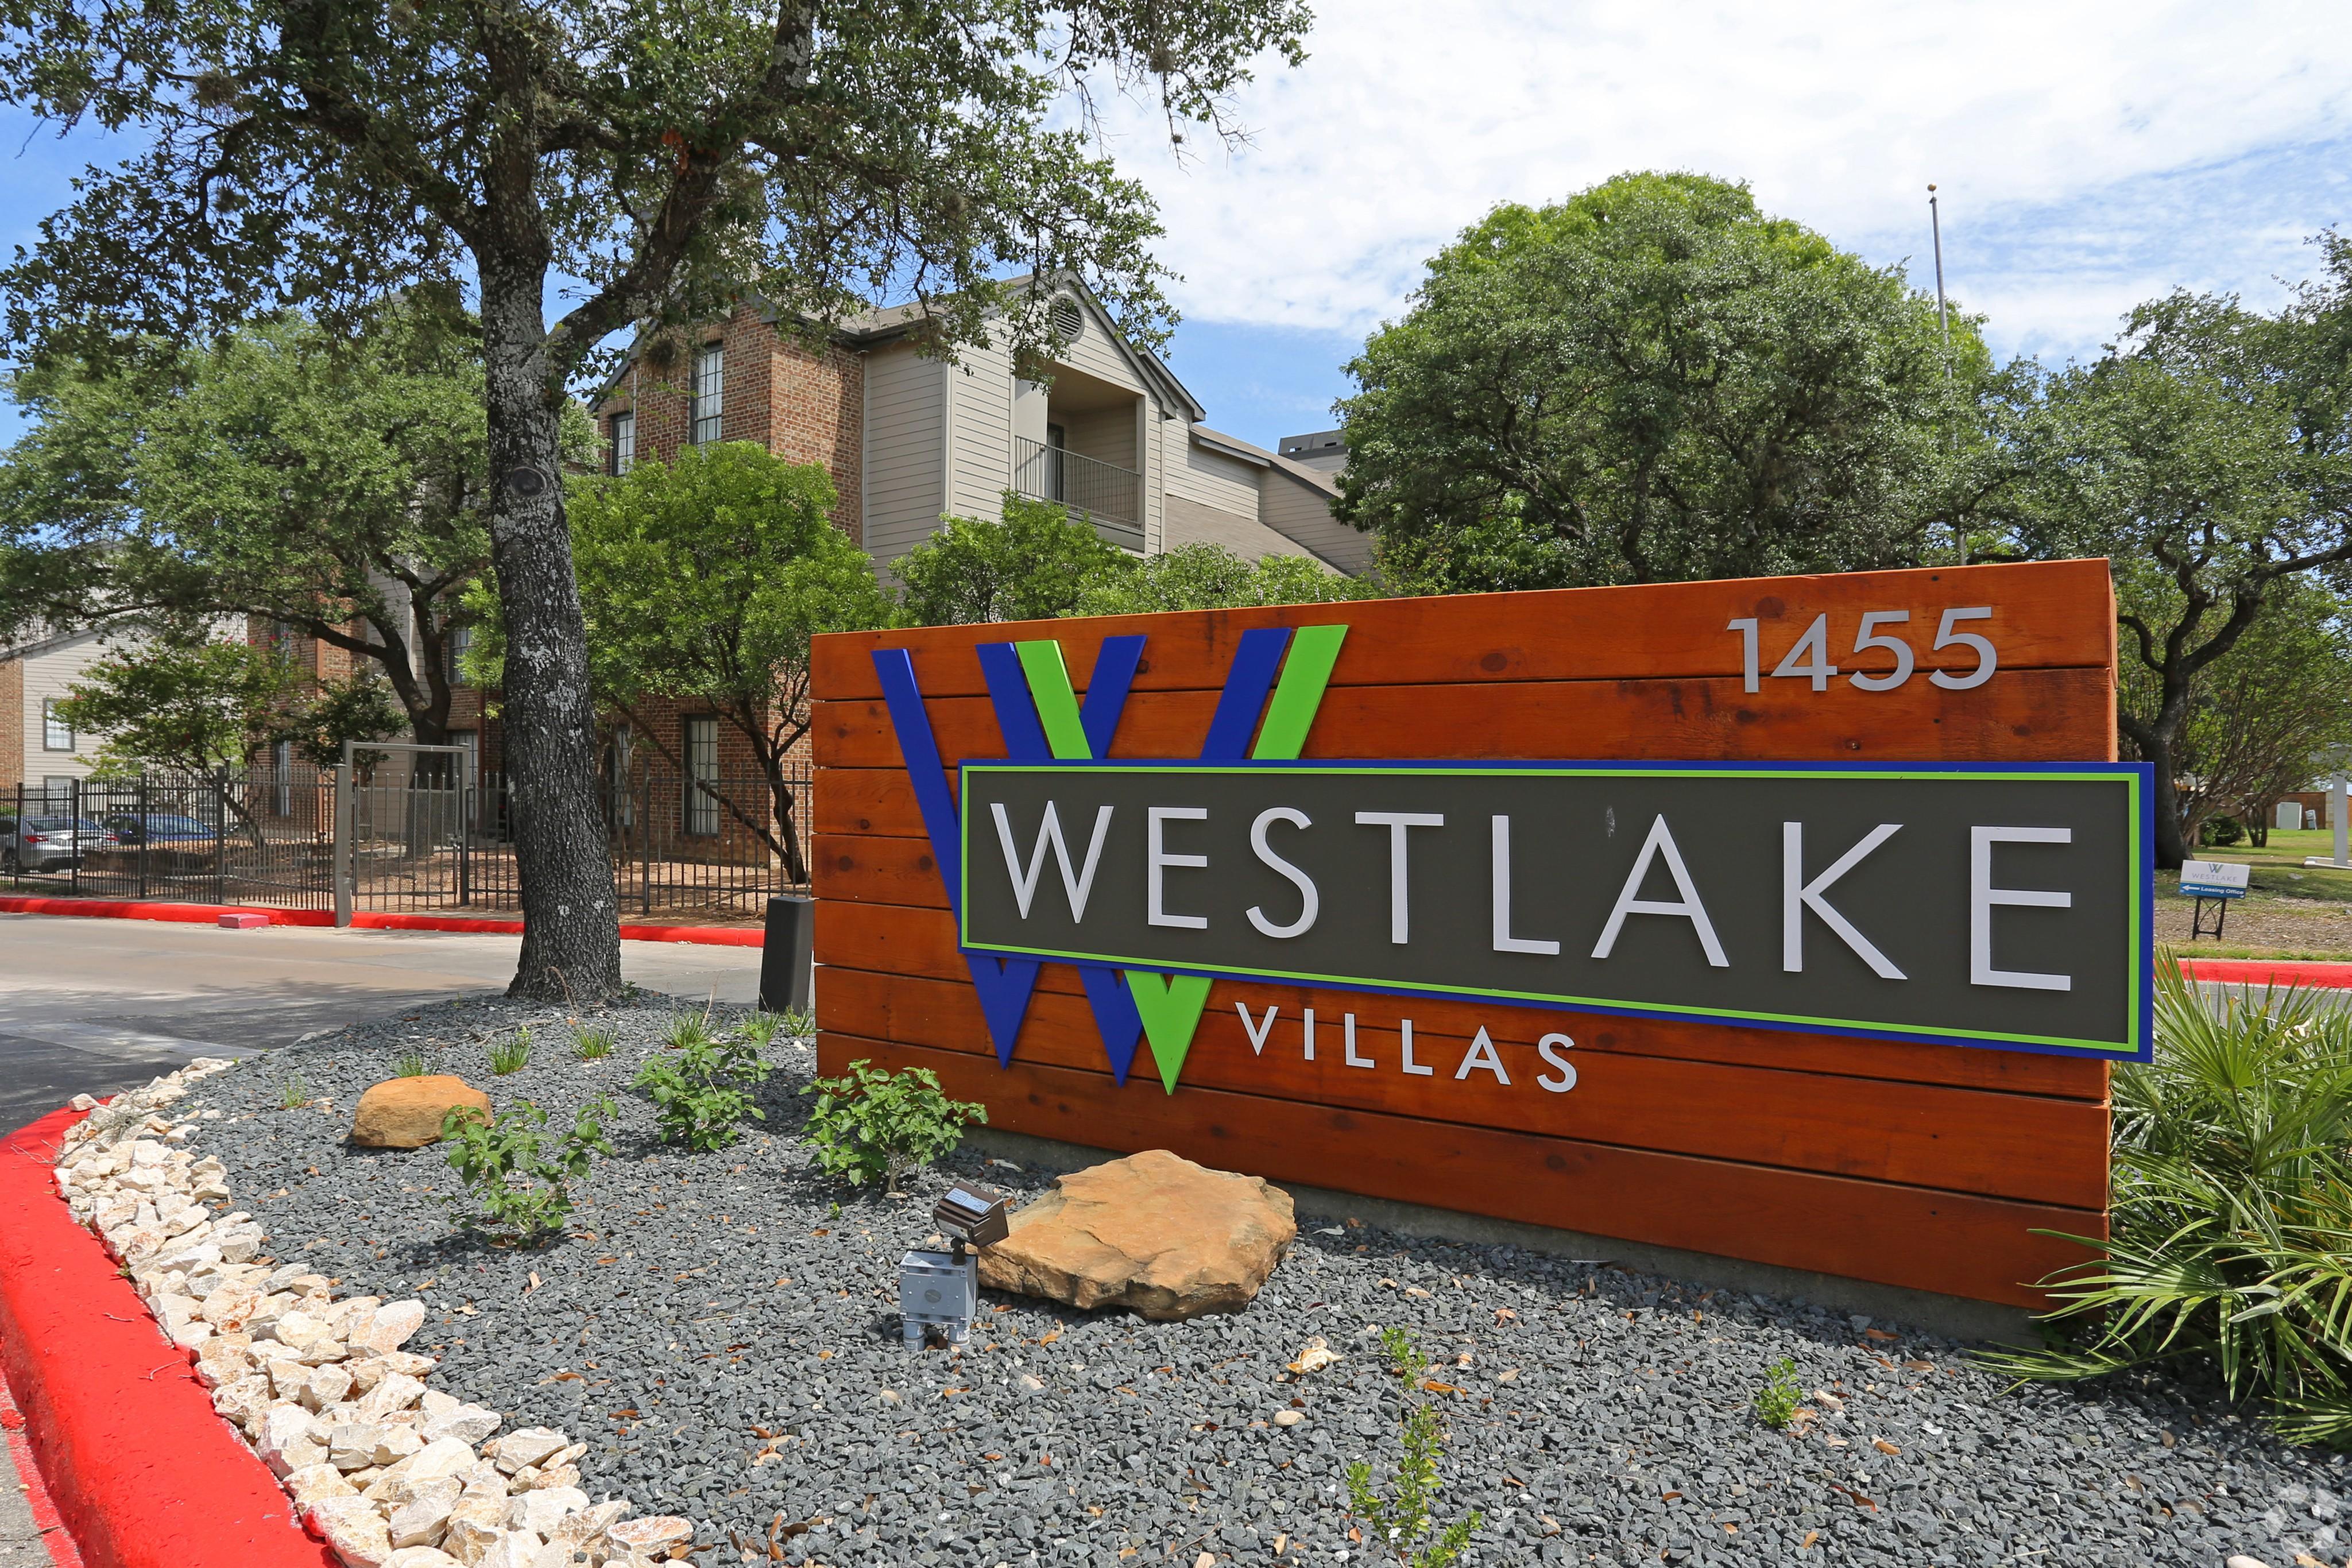 Westlake Villas